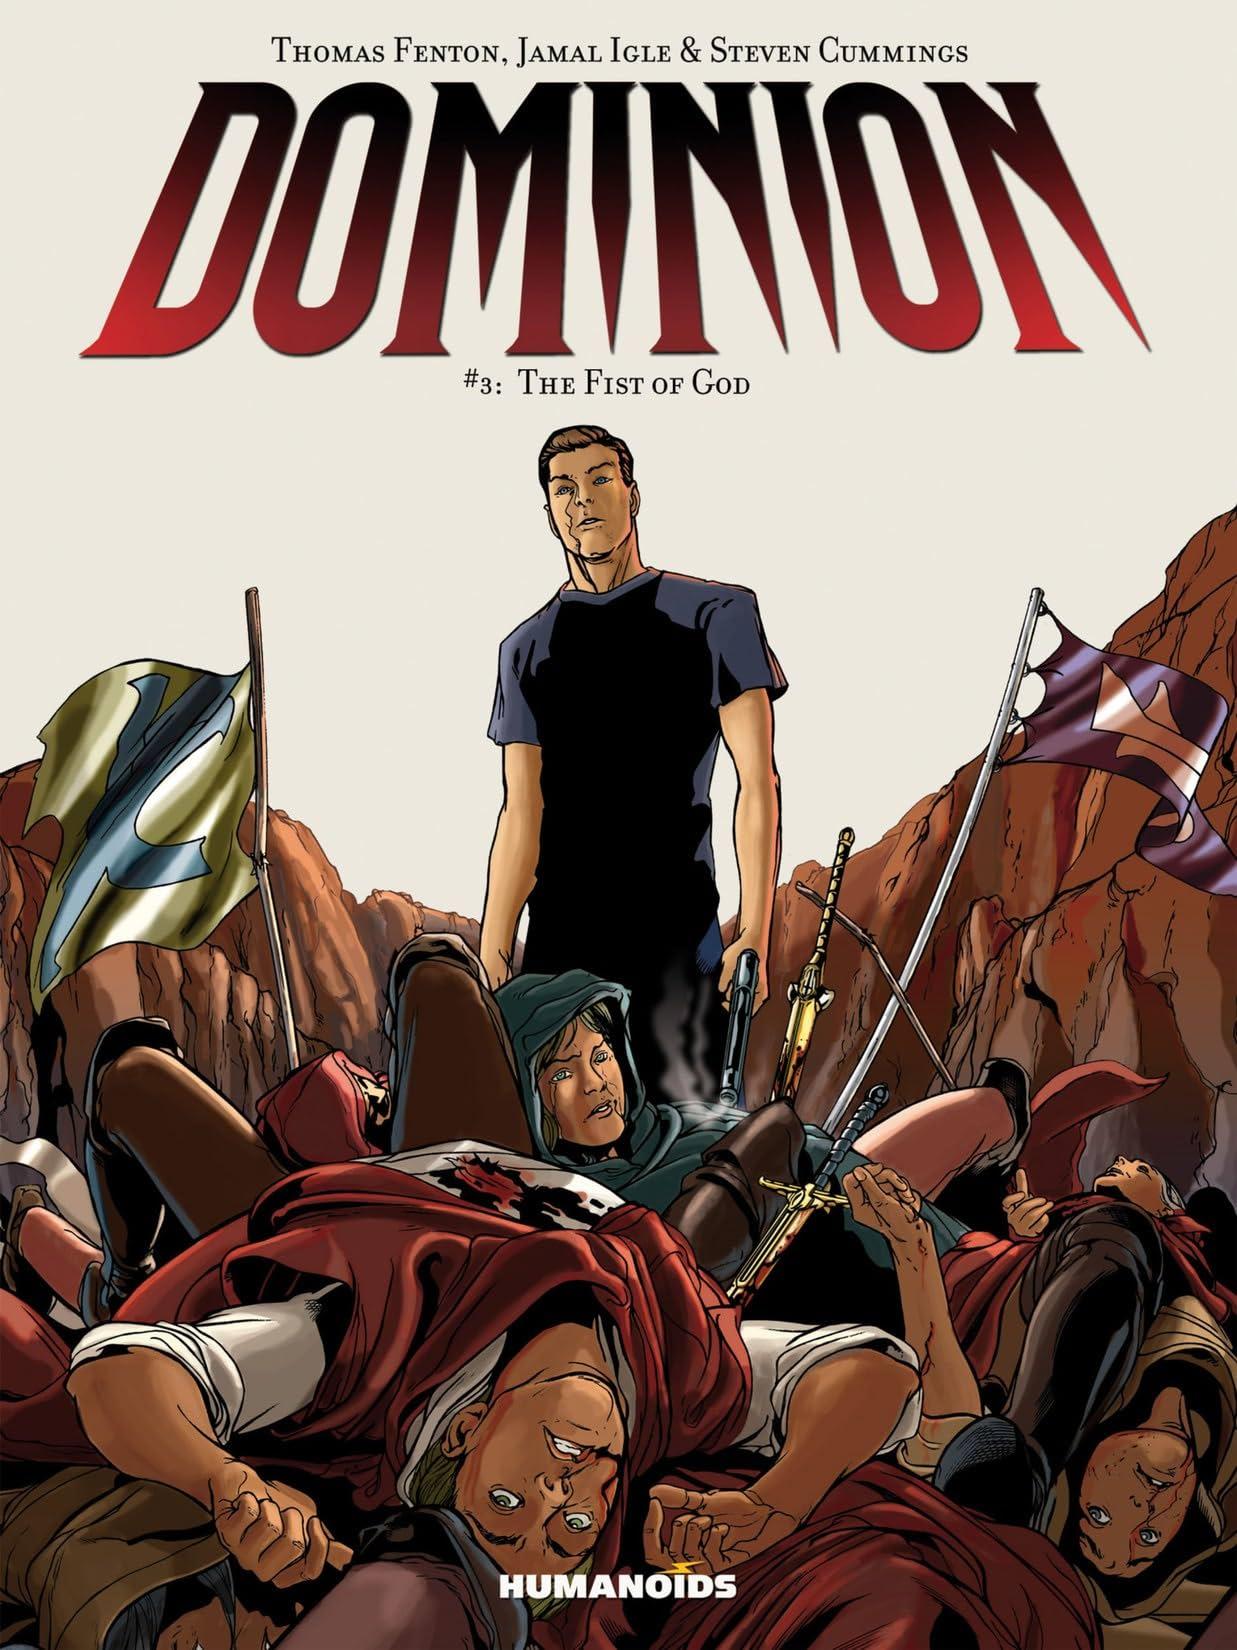 Dominion Vol. 3: The Fist of God